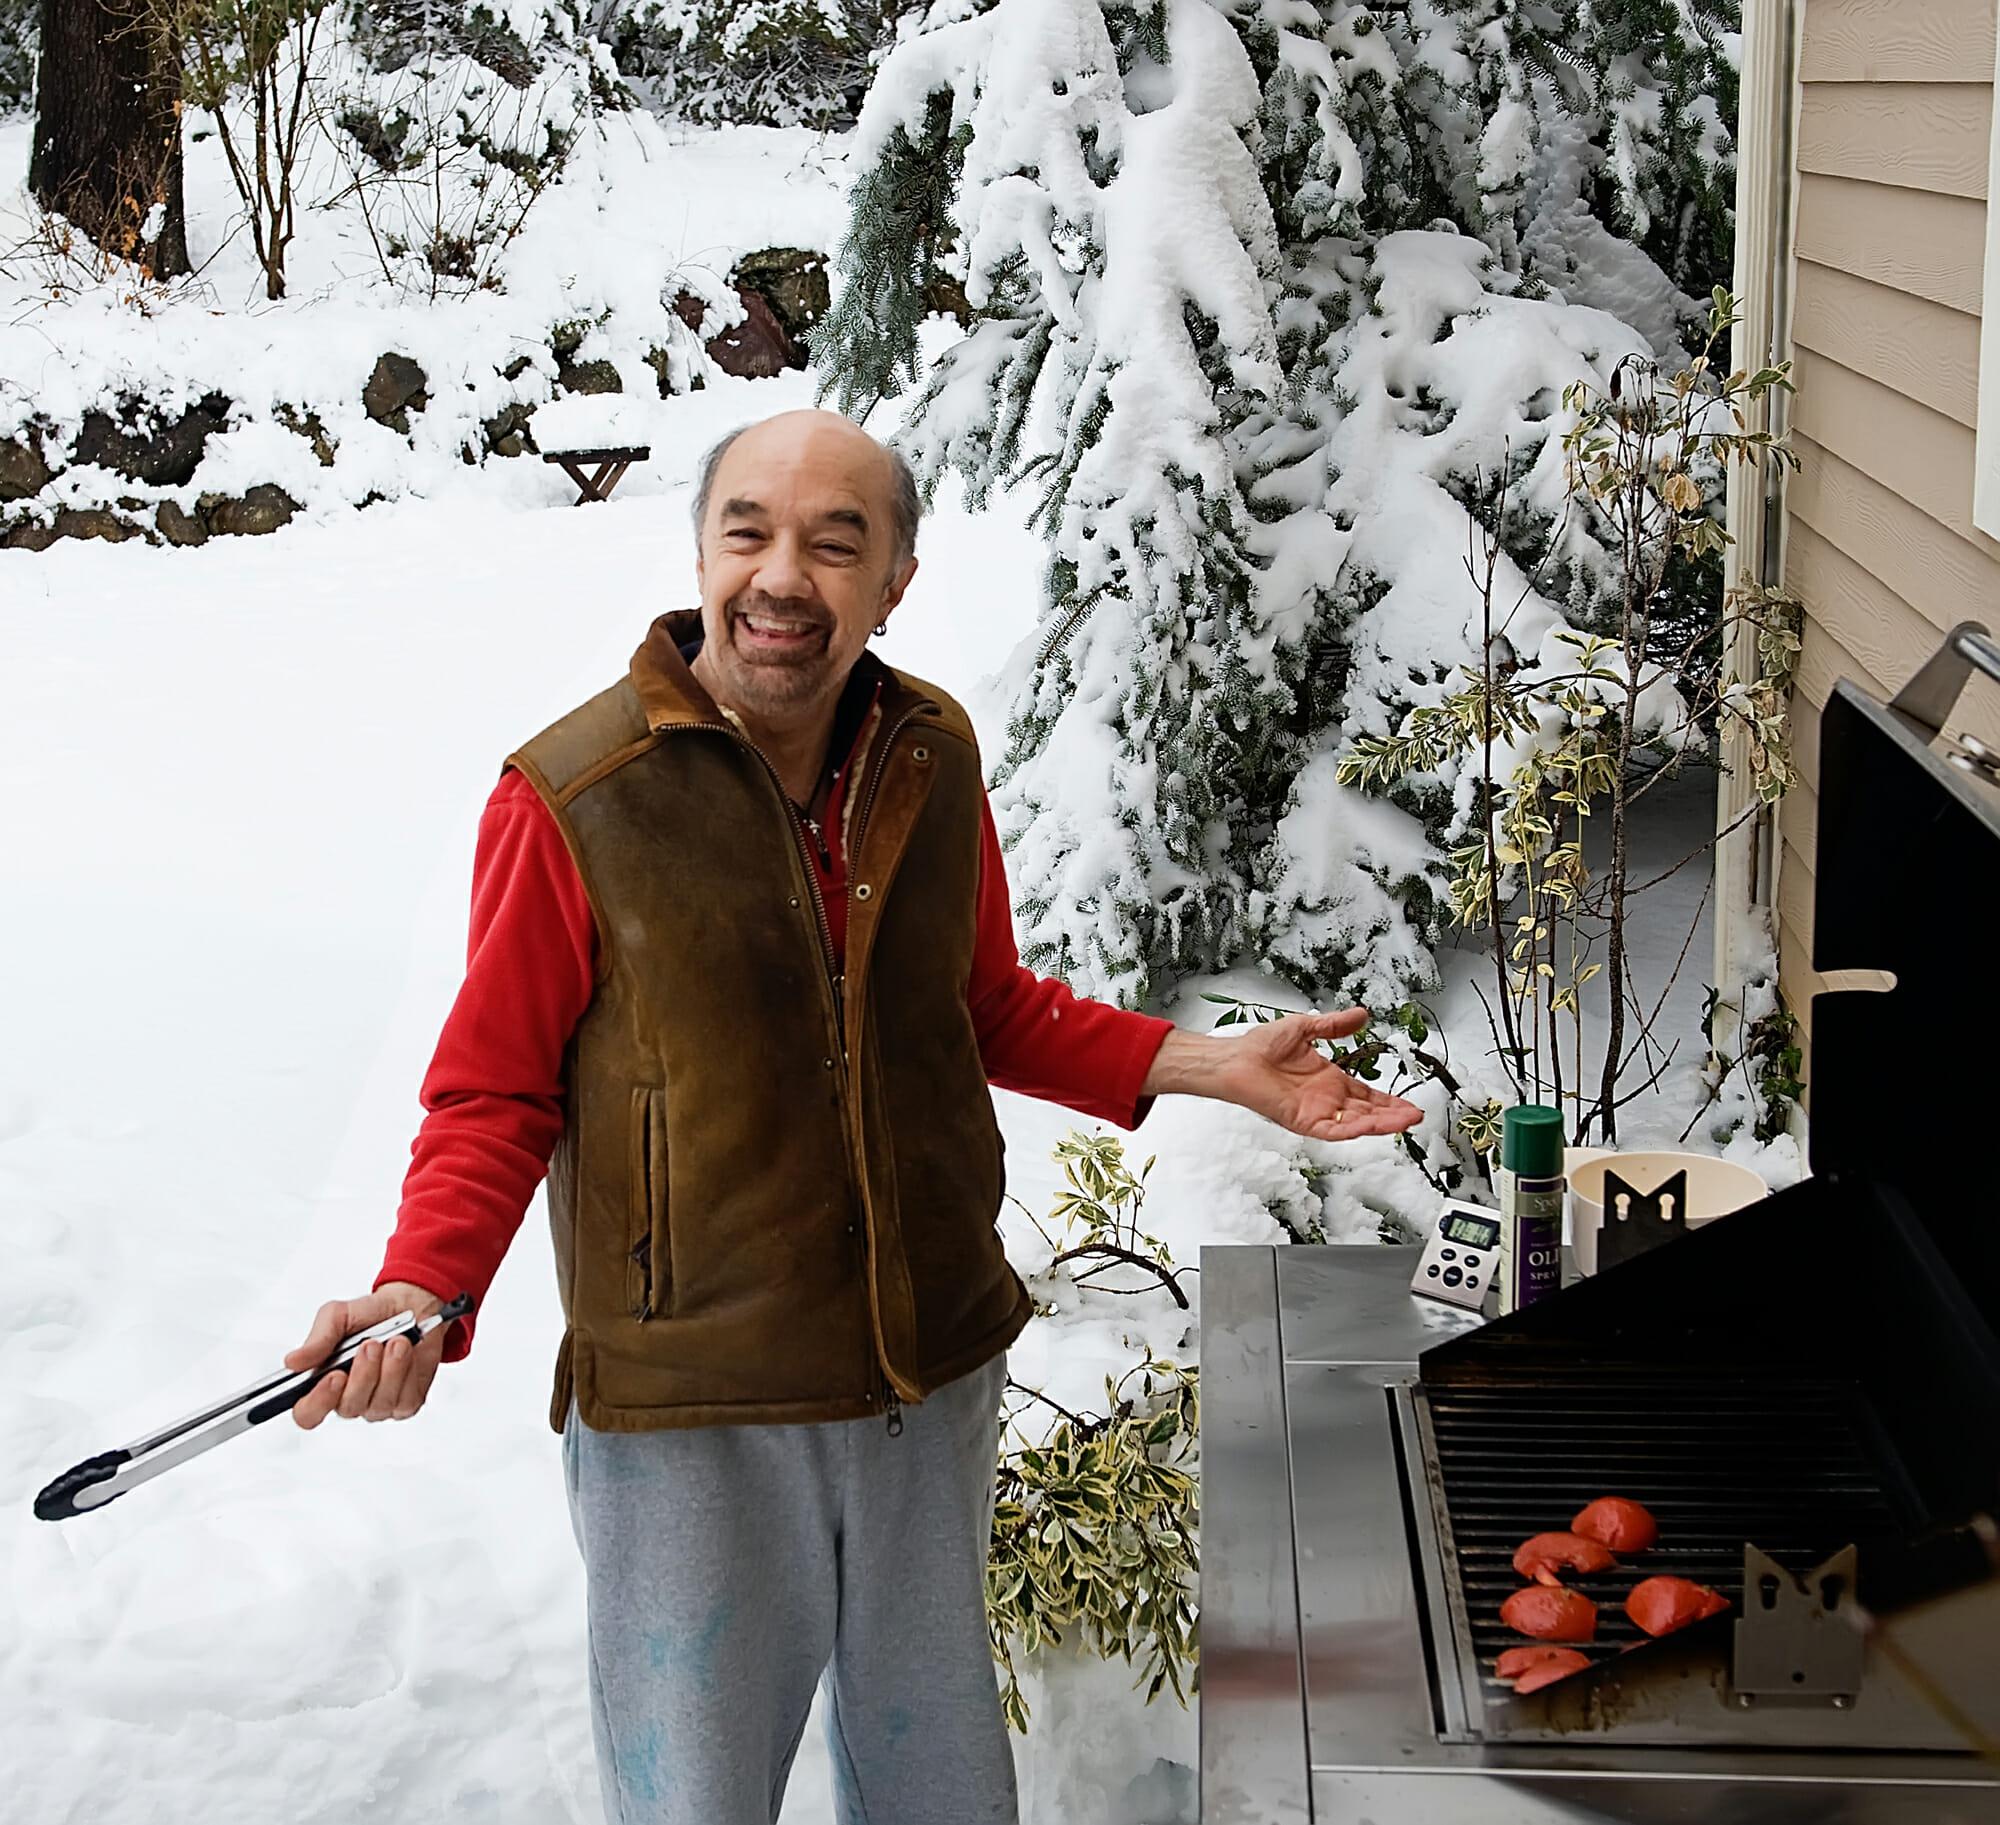 Southern husband grills tomatoes